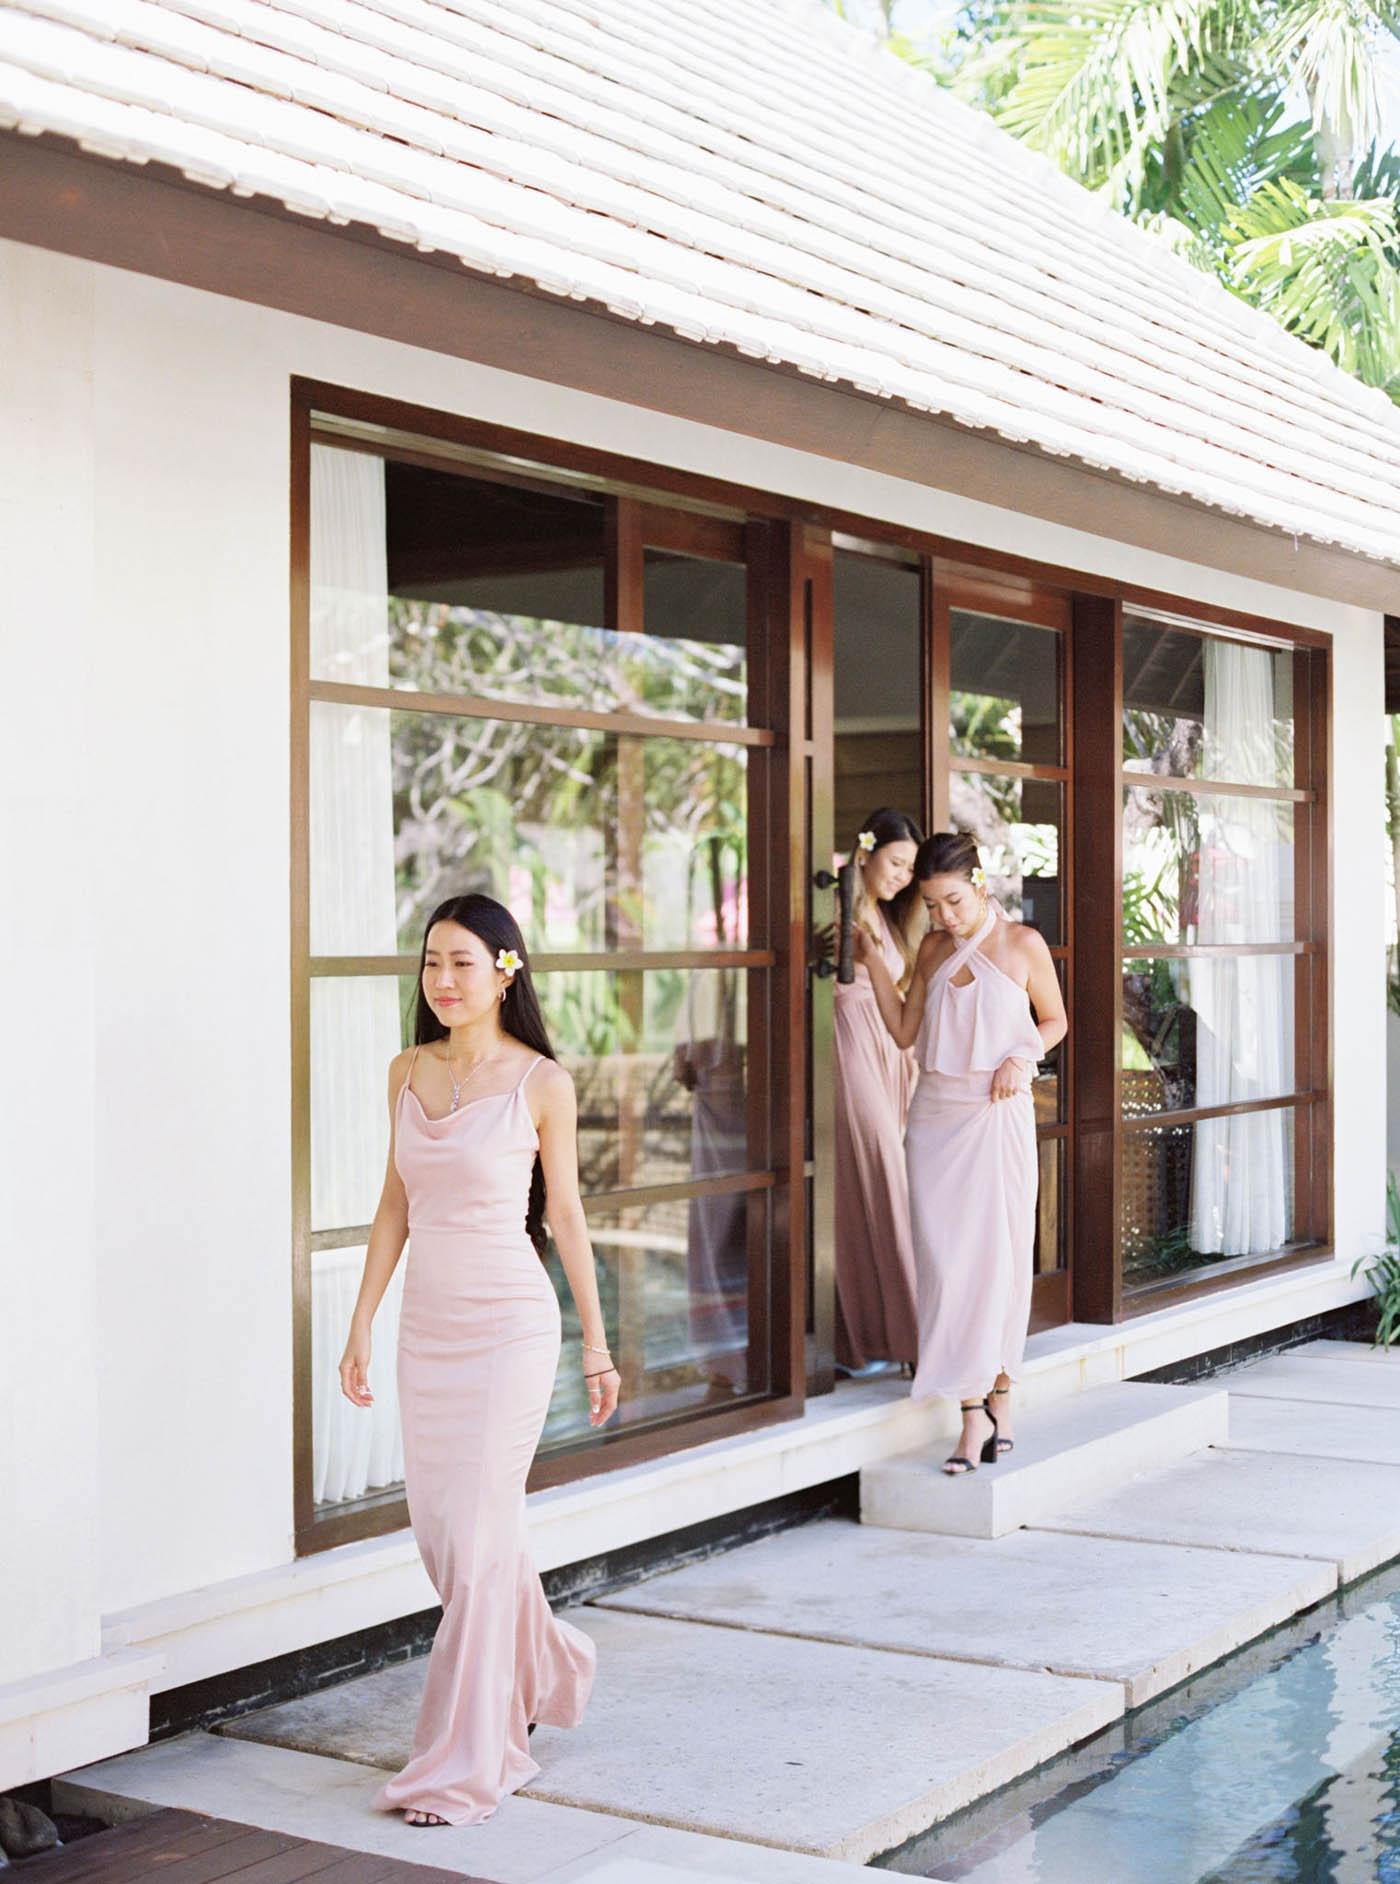 峇里島婚禮 Royal Santrian-婚禮-STAGE-fine-art-film-wedding-海外